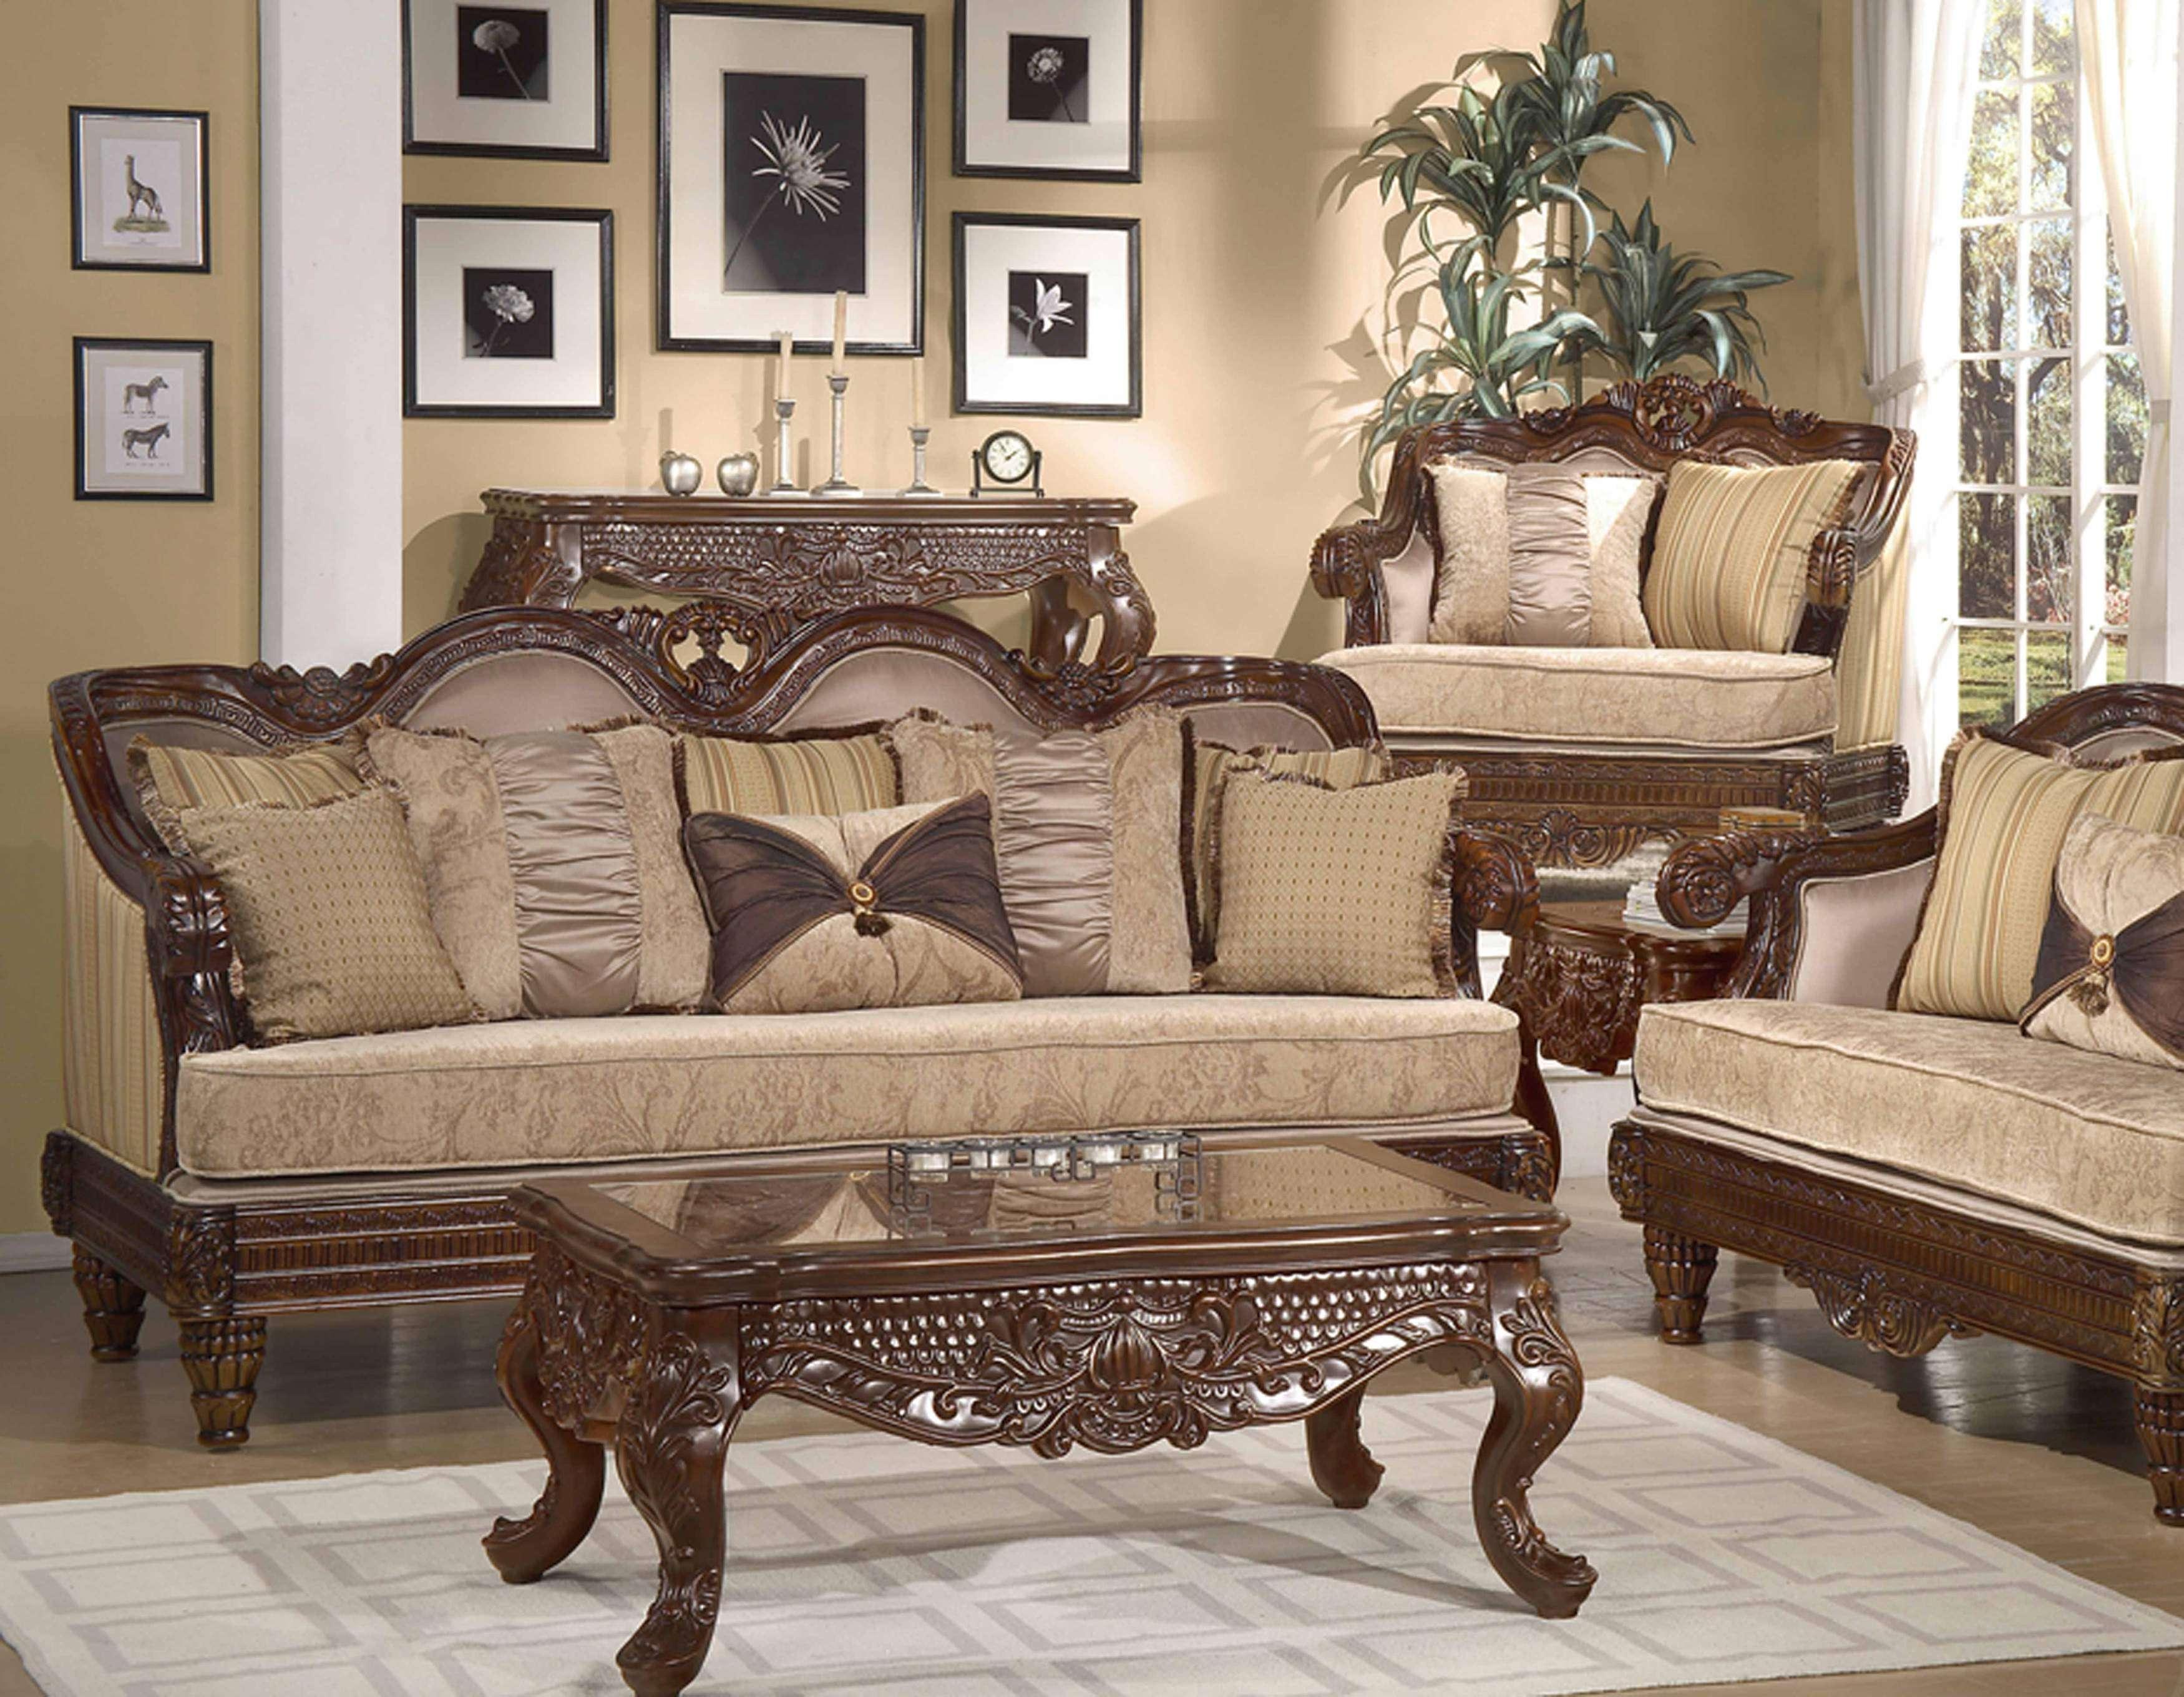 Latest Modern Home Decoration Interior Design Ideas